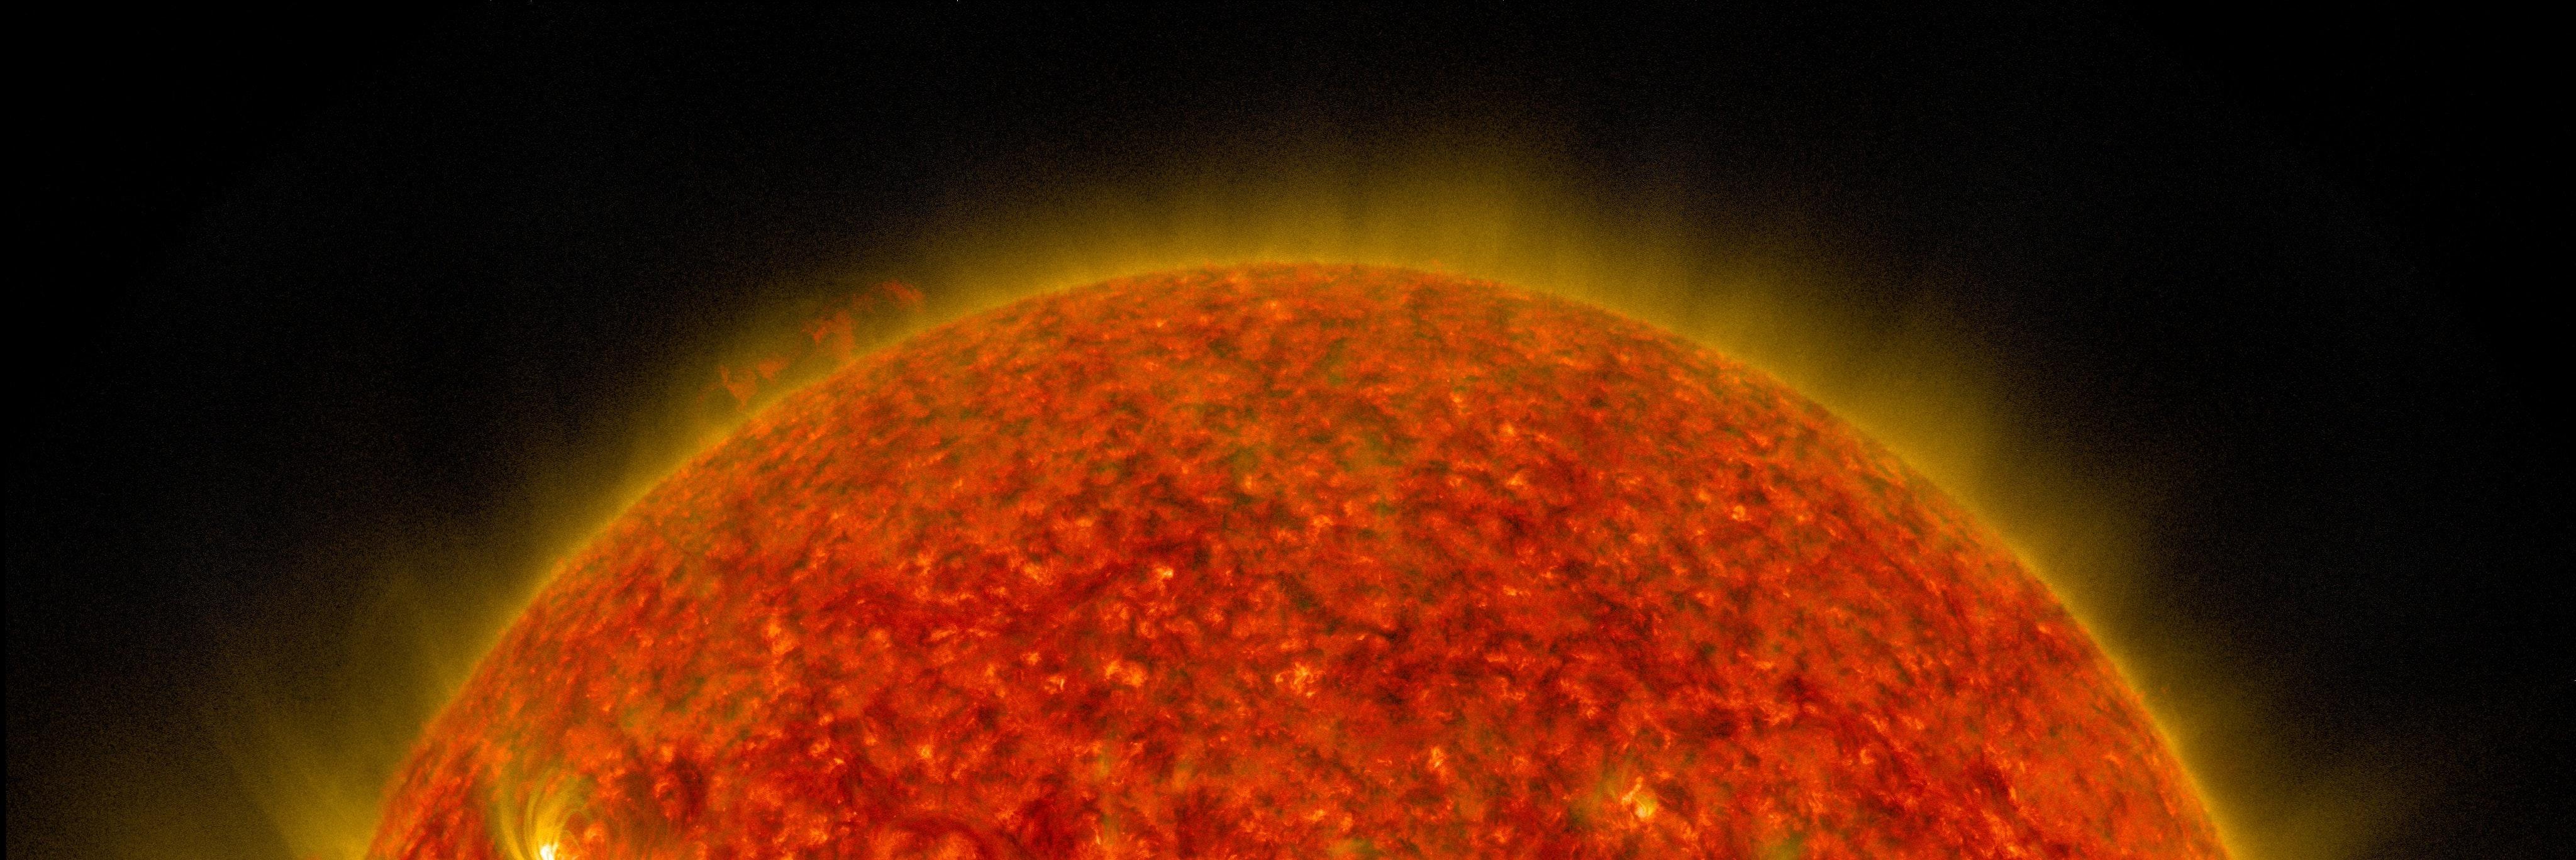 NASA's SDO Sees a Solar Flare and a Lunar Transit